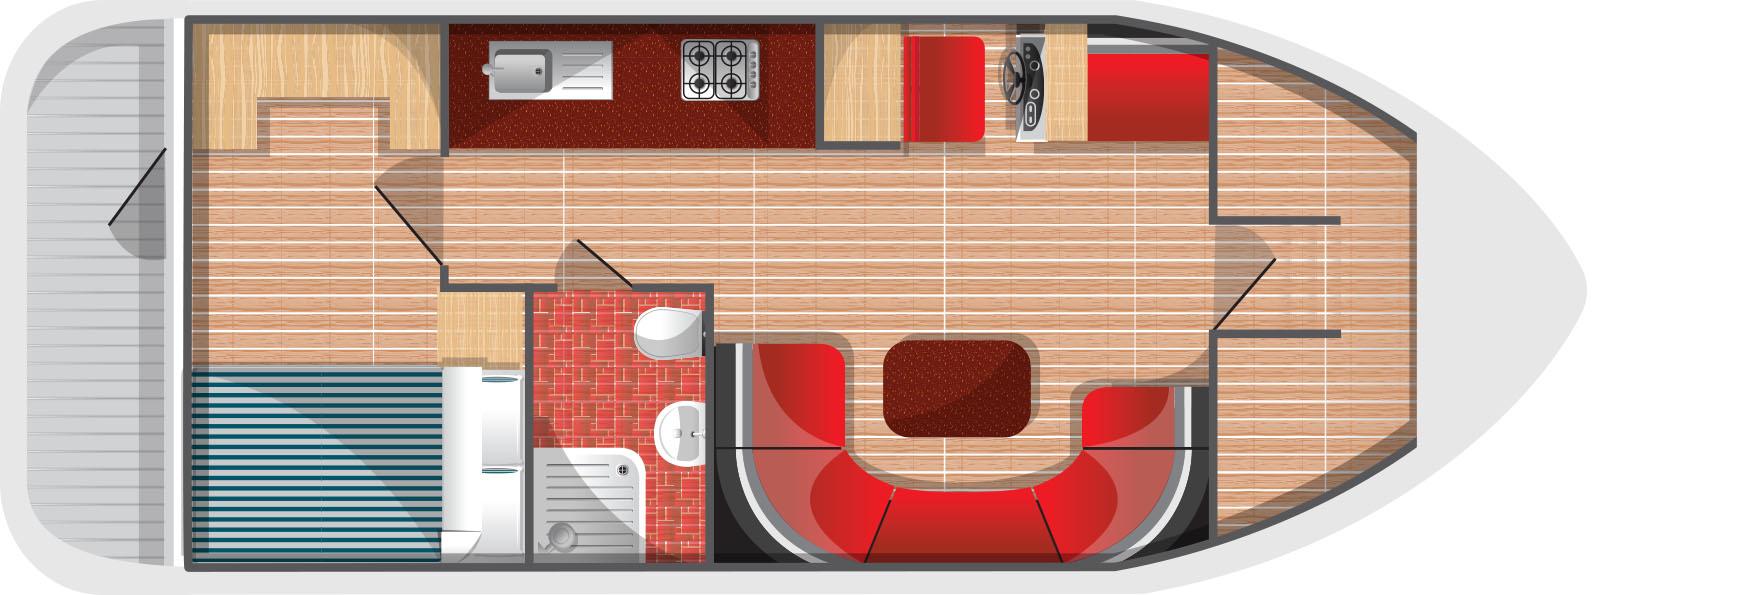 Floorplan for Fair Viscount